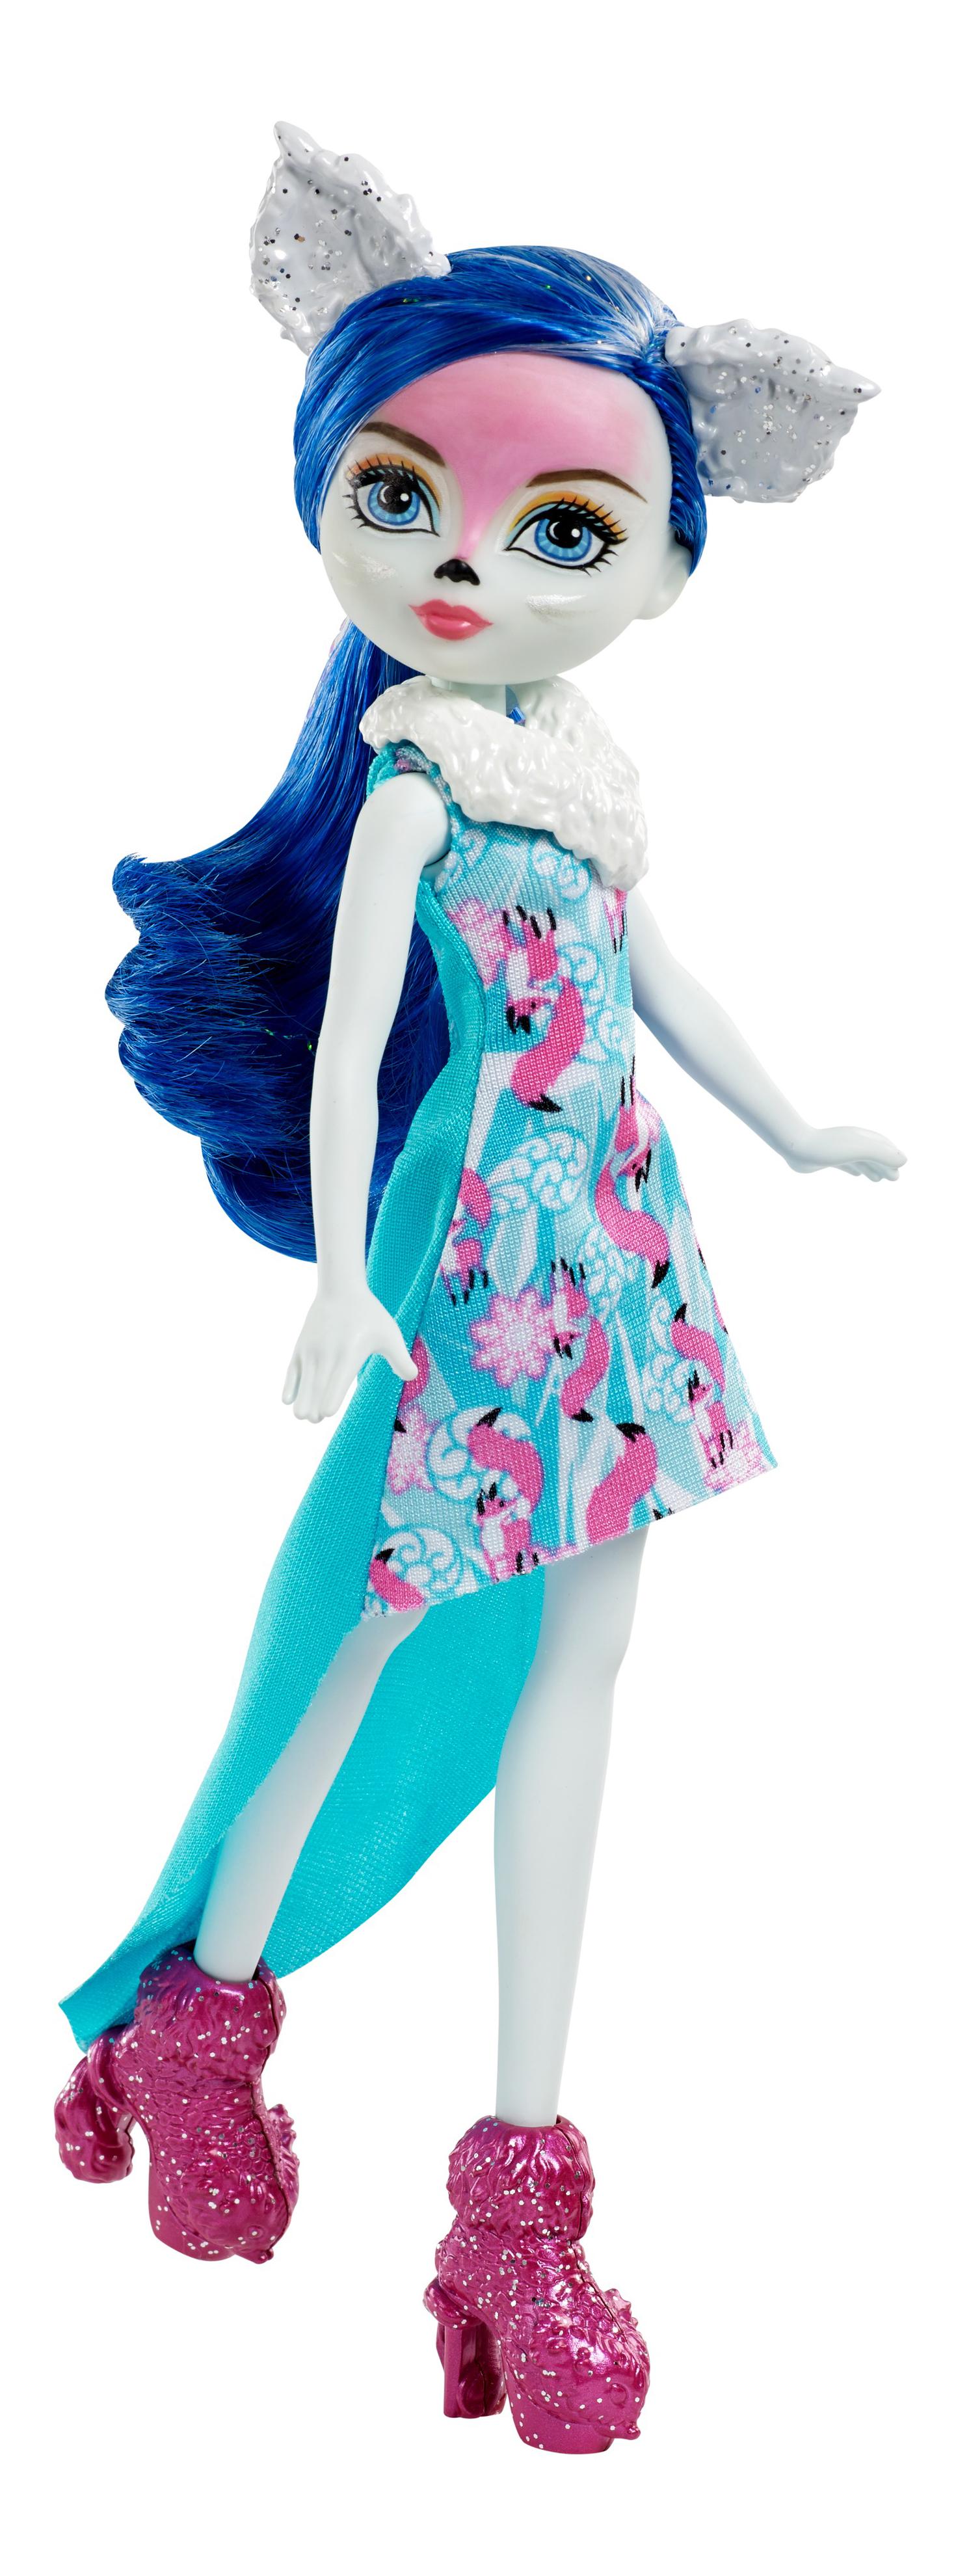 Купить Кукла Ever After High Заколдованная зима DNR63 DNR64, Куклы